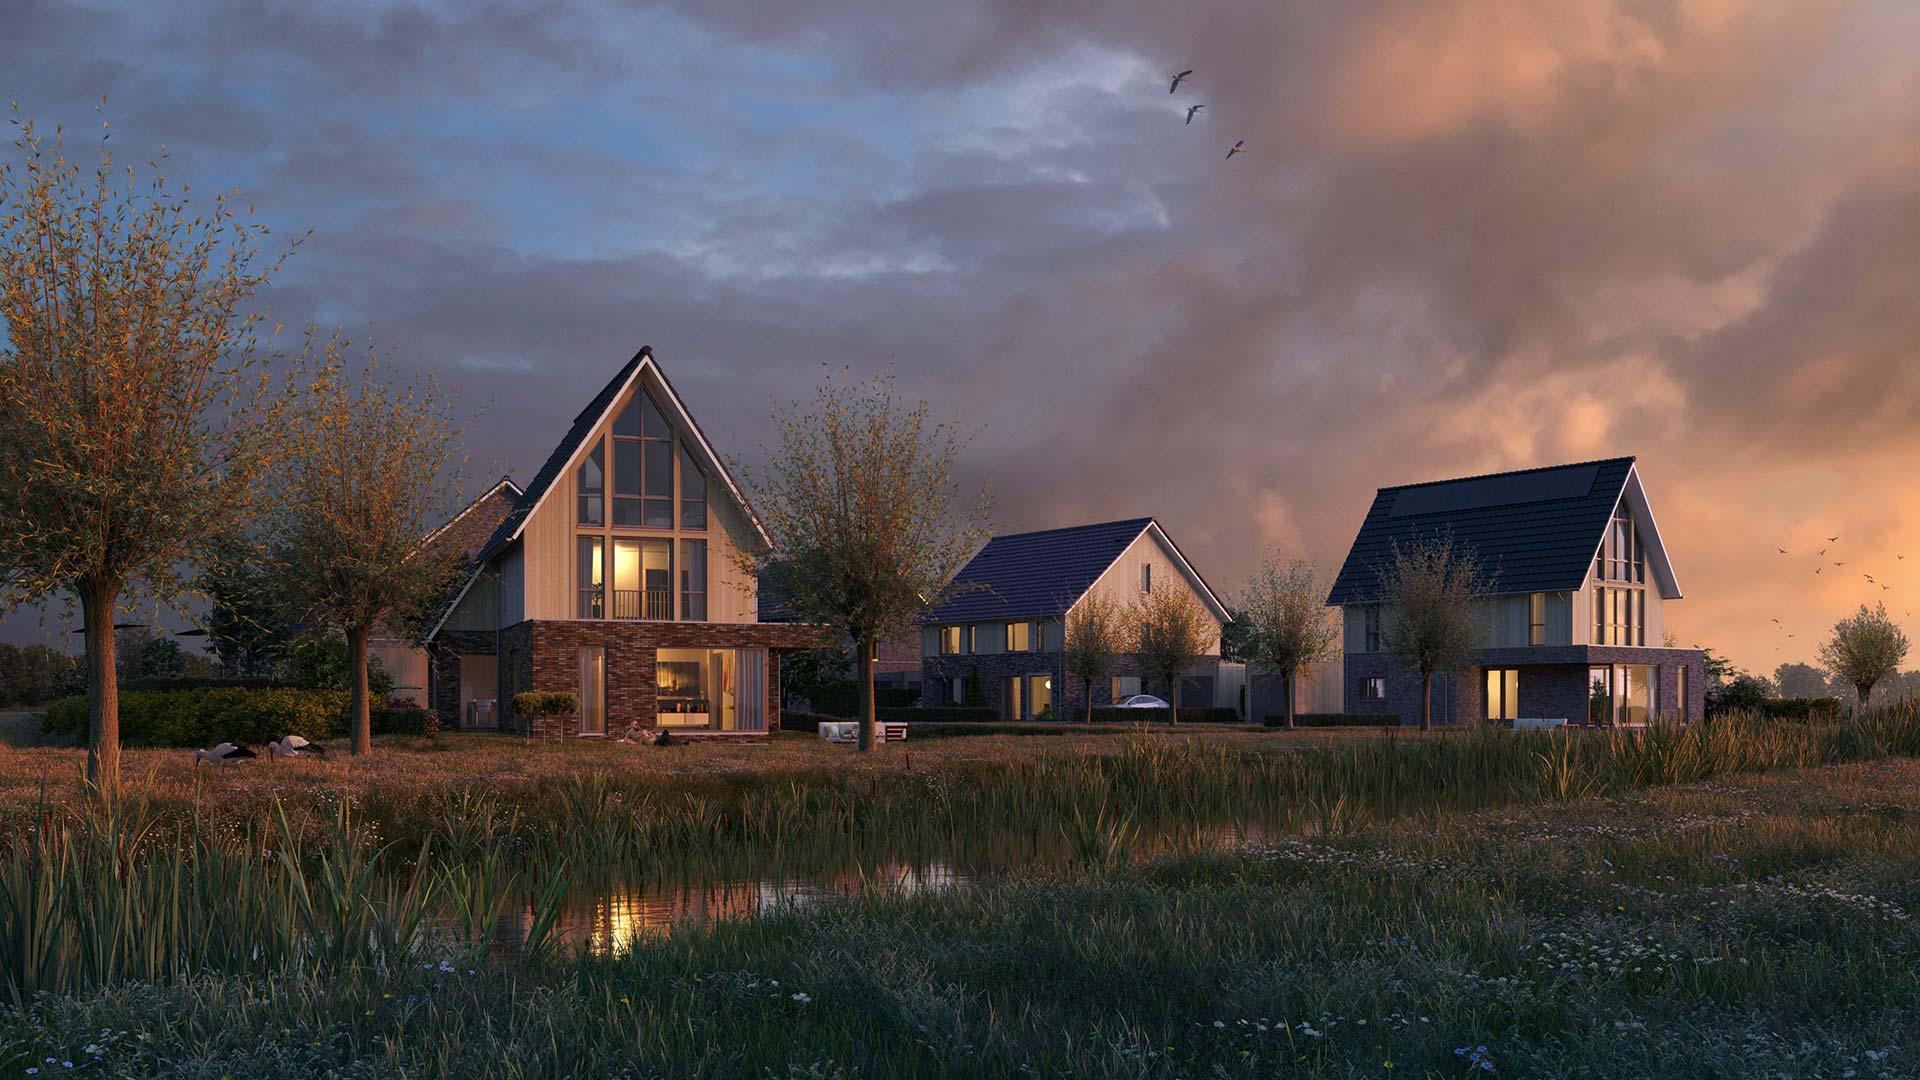 Beektuin-villa's_Nijkerk_Weusten-Liedenbaum-Architecten